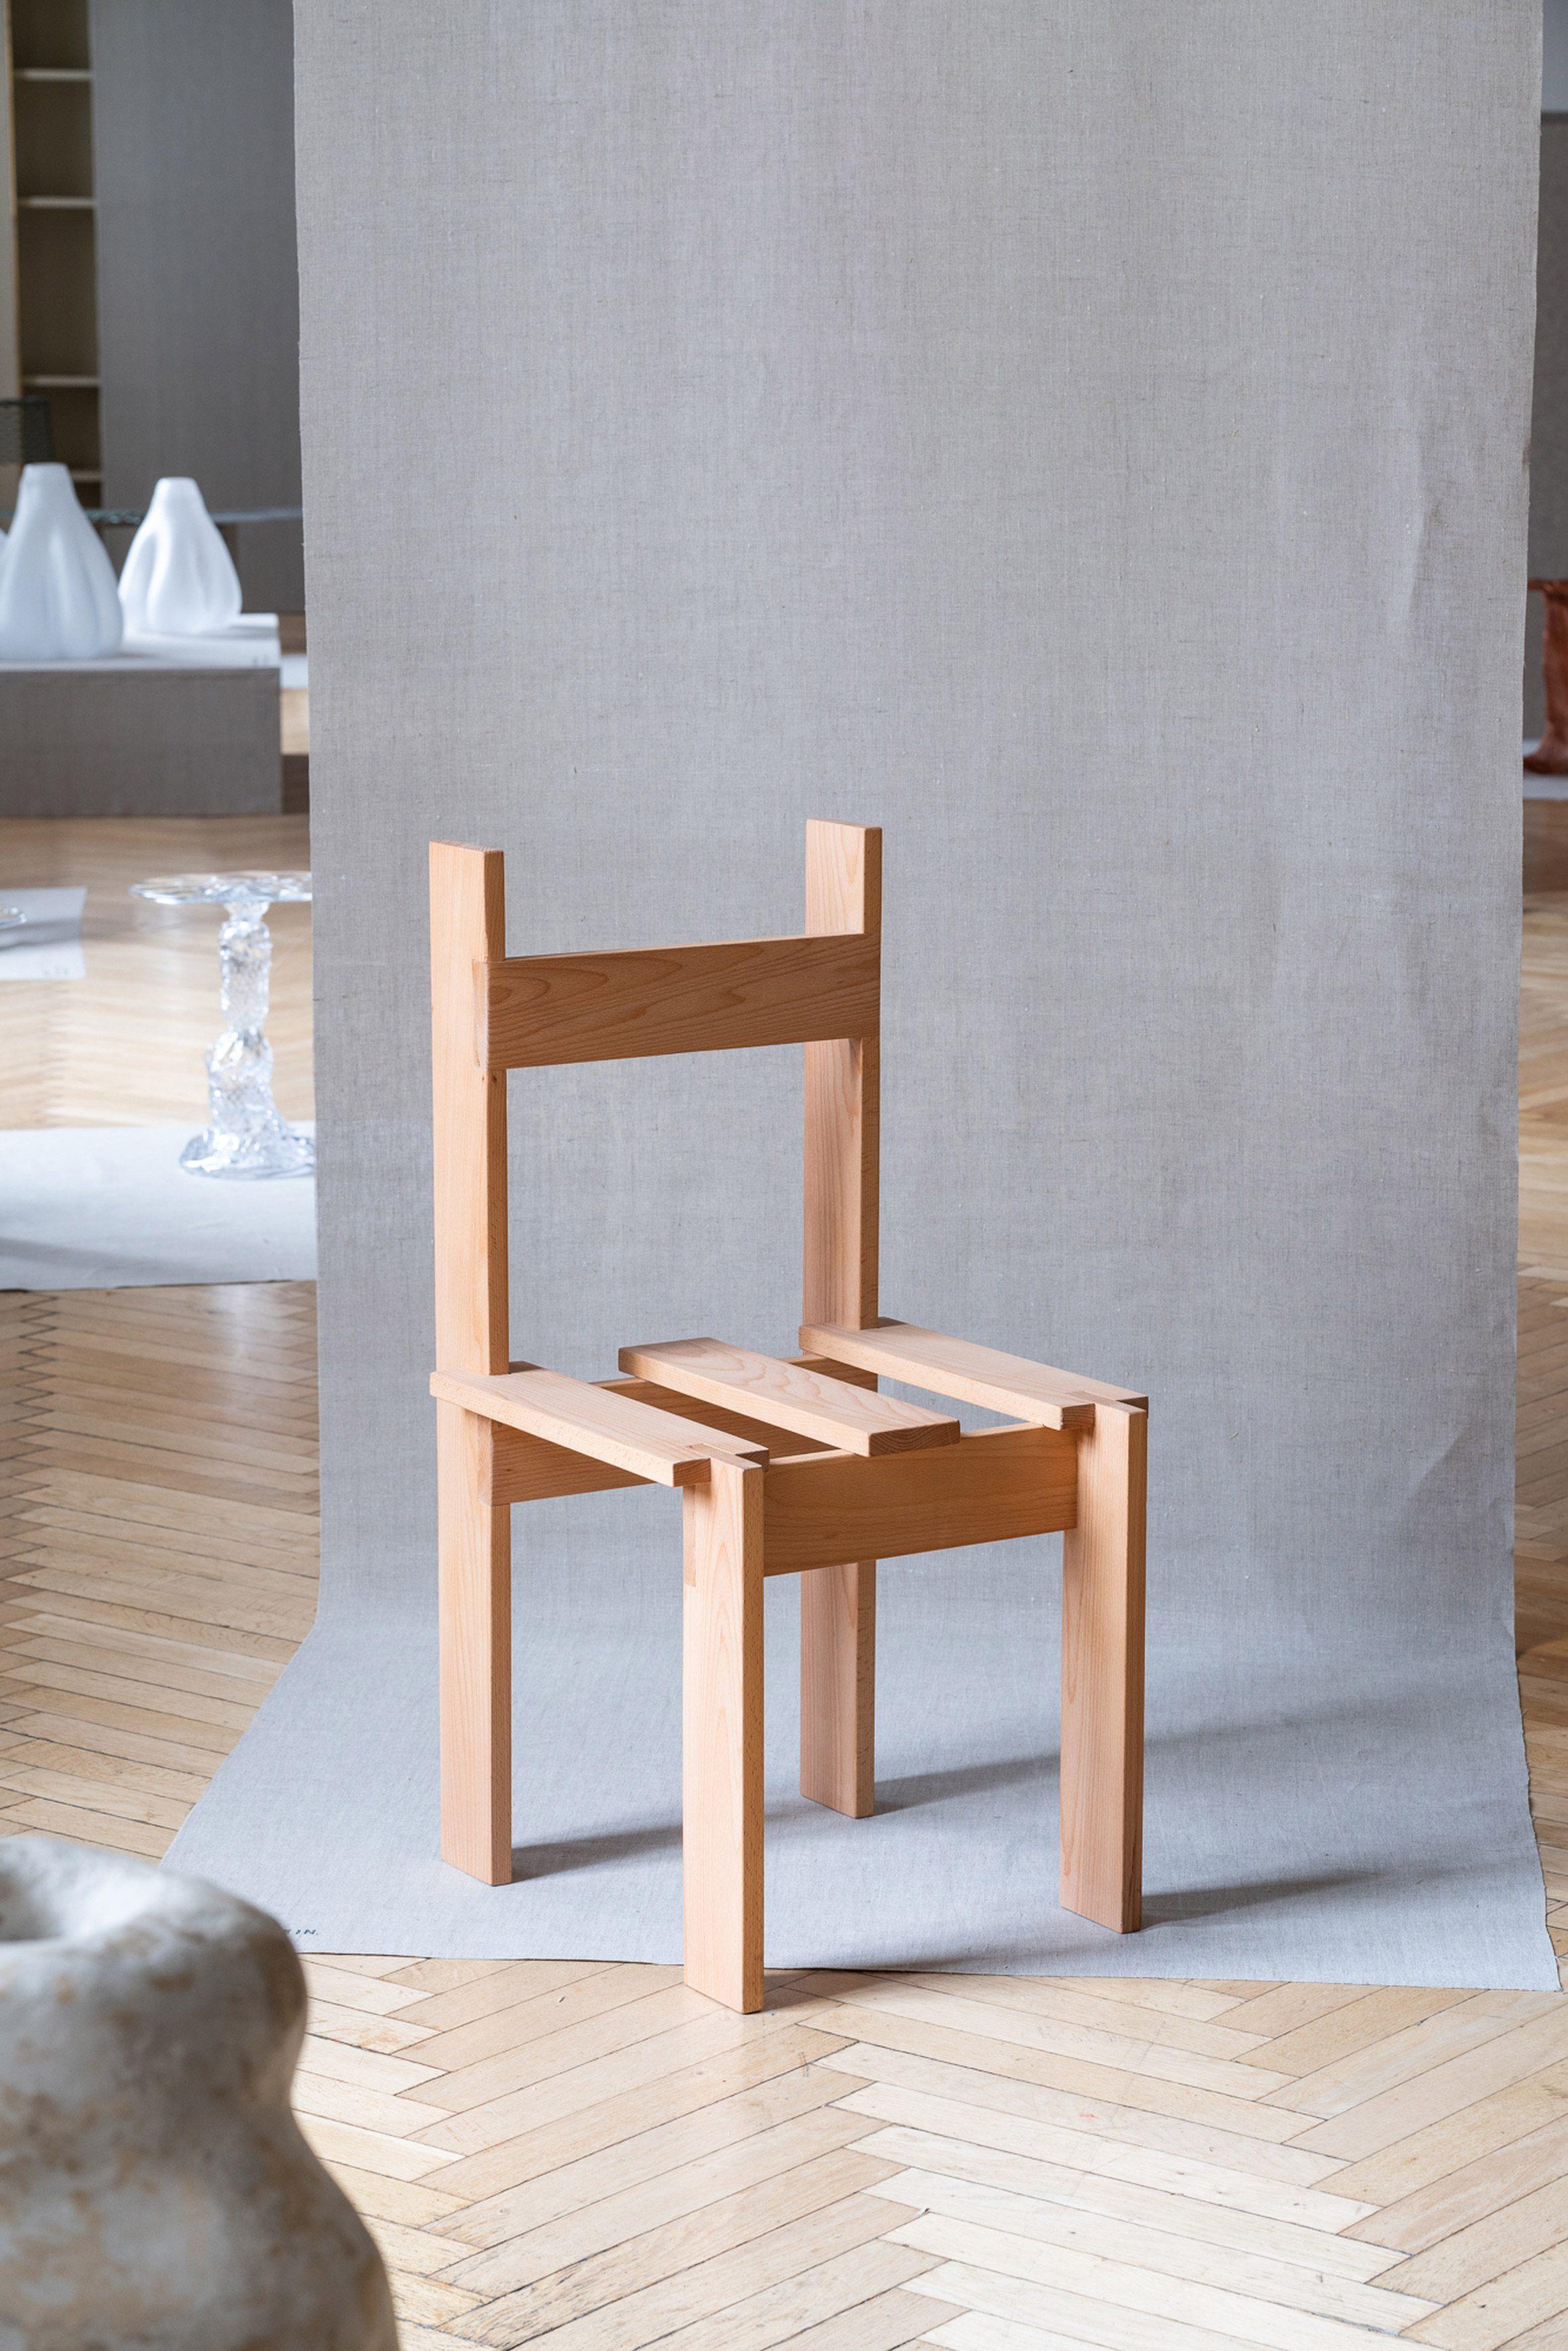 Lath Chair, Ukurant Perspectives